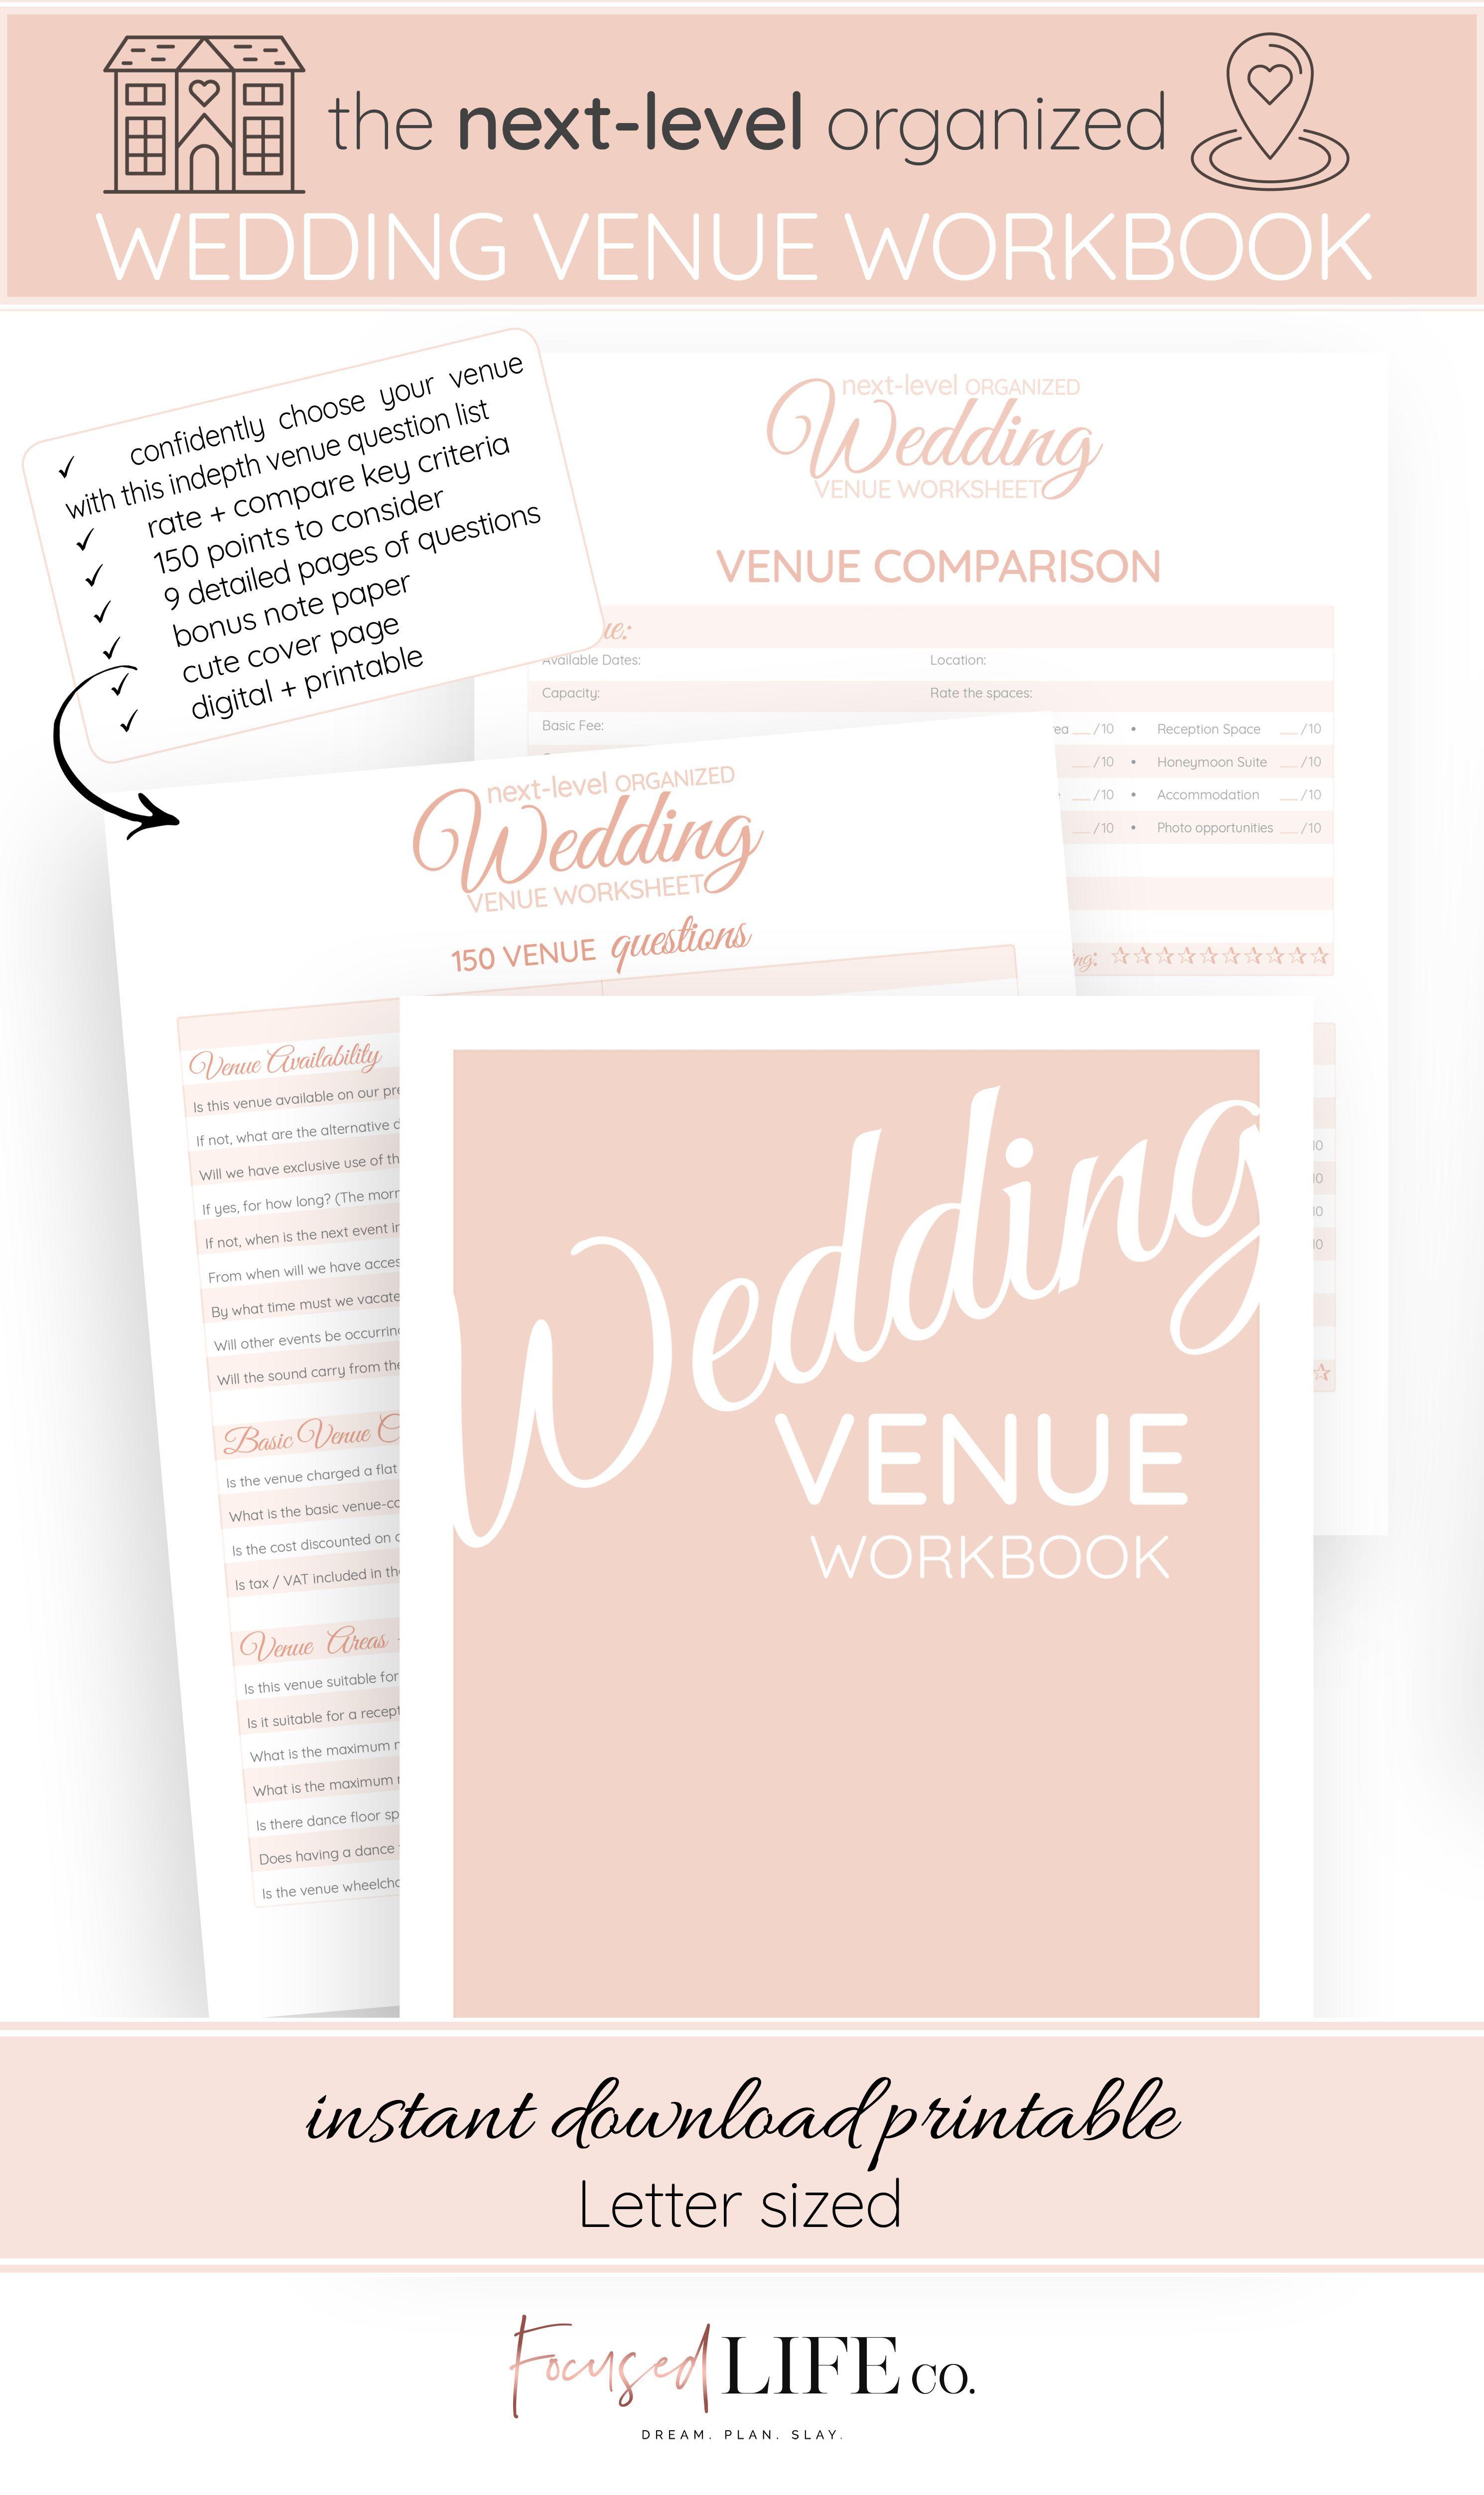 150 Question Wedding Venue Checklist Wedding Planning Series Part 5 In 2021 Wedding Venue Questions Wedding Venues Checklist This Or That Questions